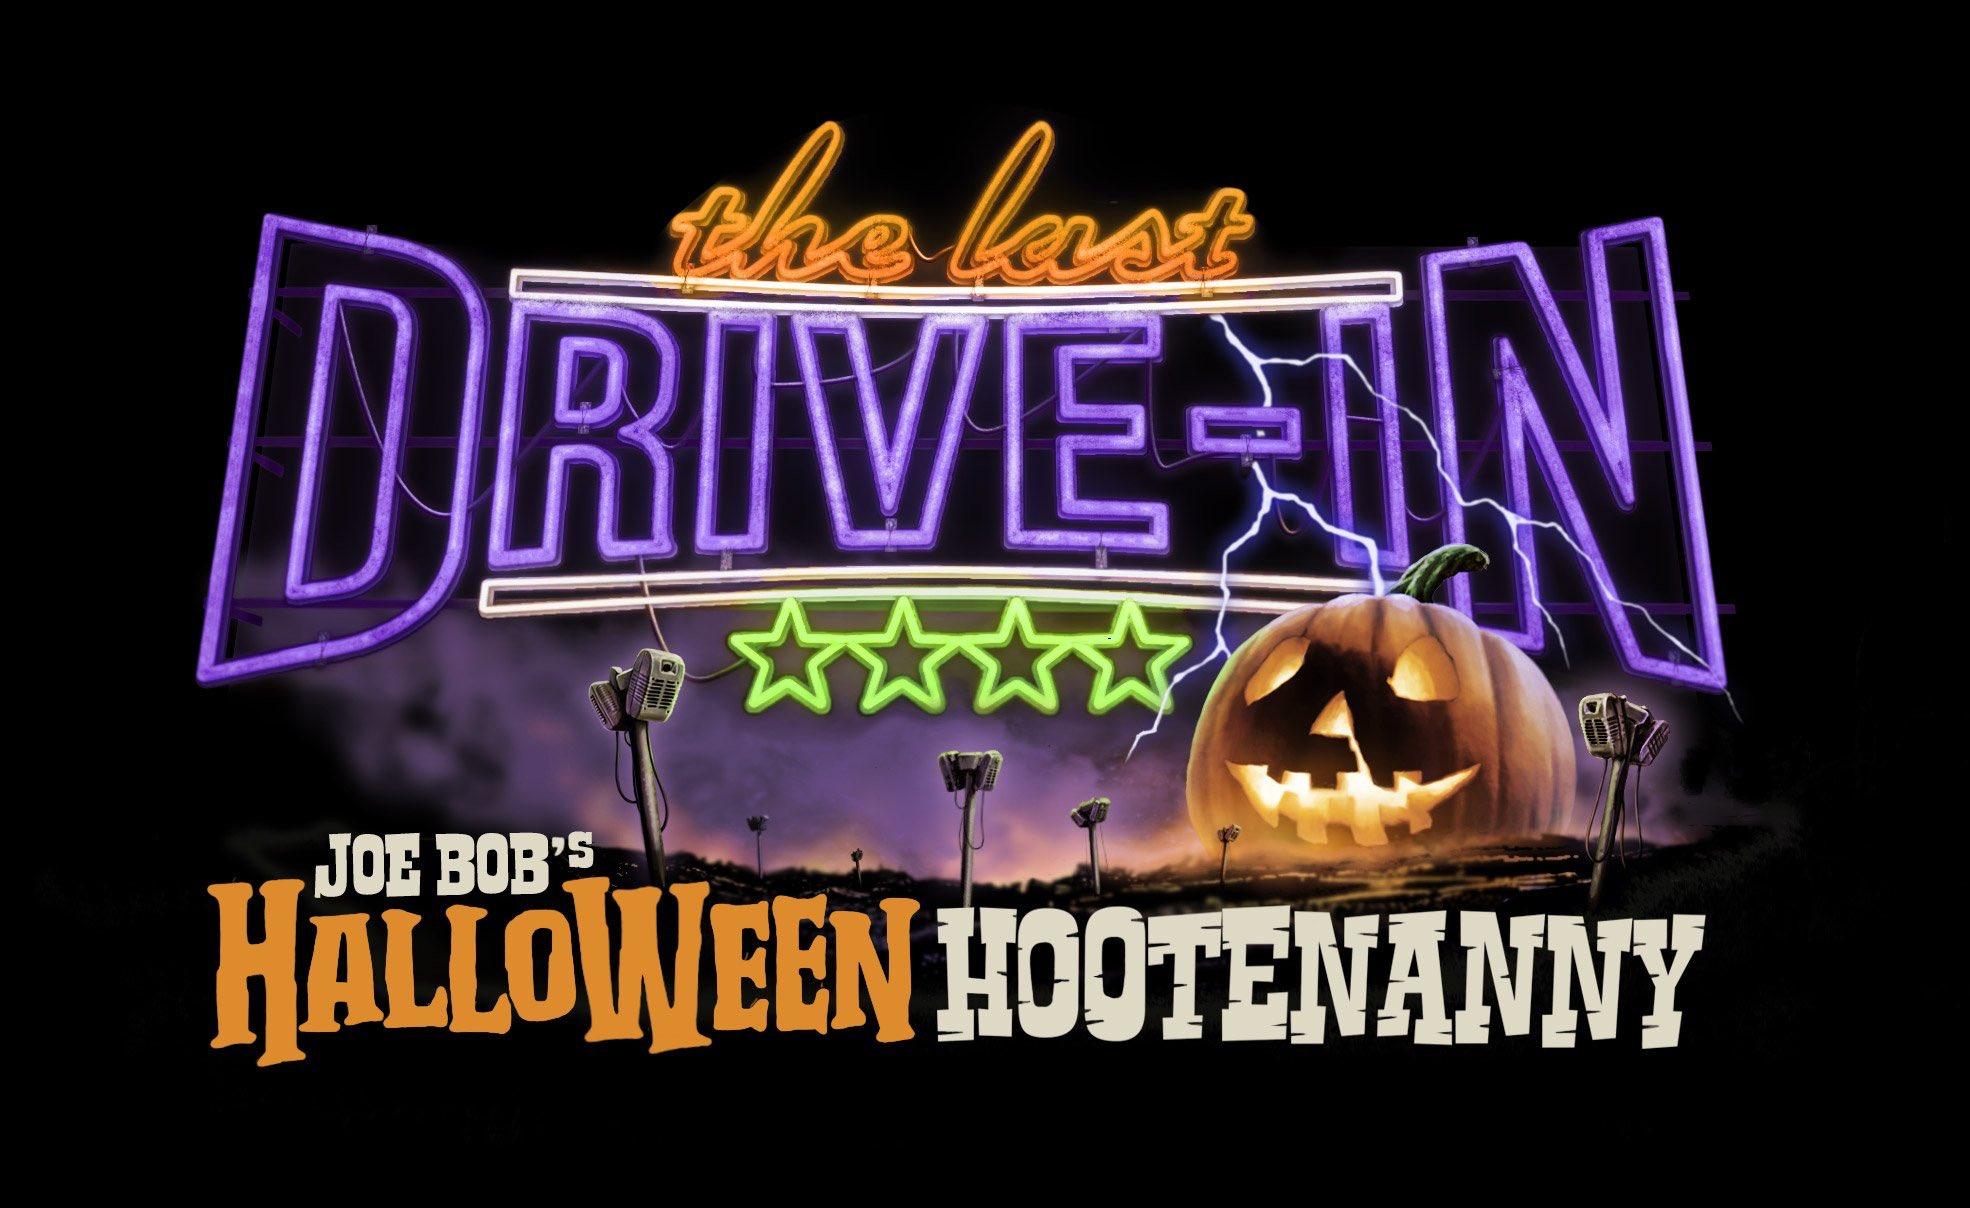 Joe Bob Briggs Returns To Shudder For His Halloween Hootenanny